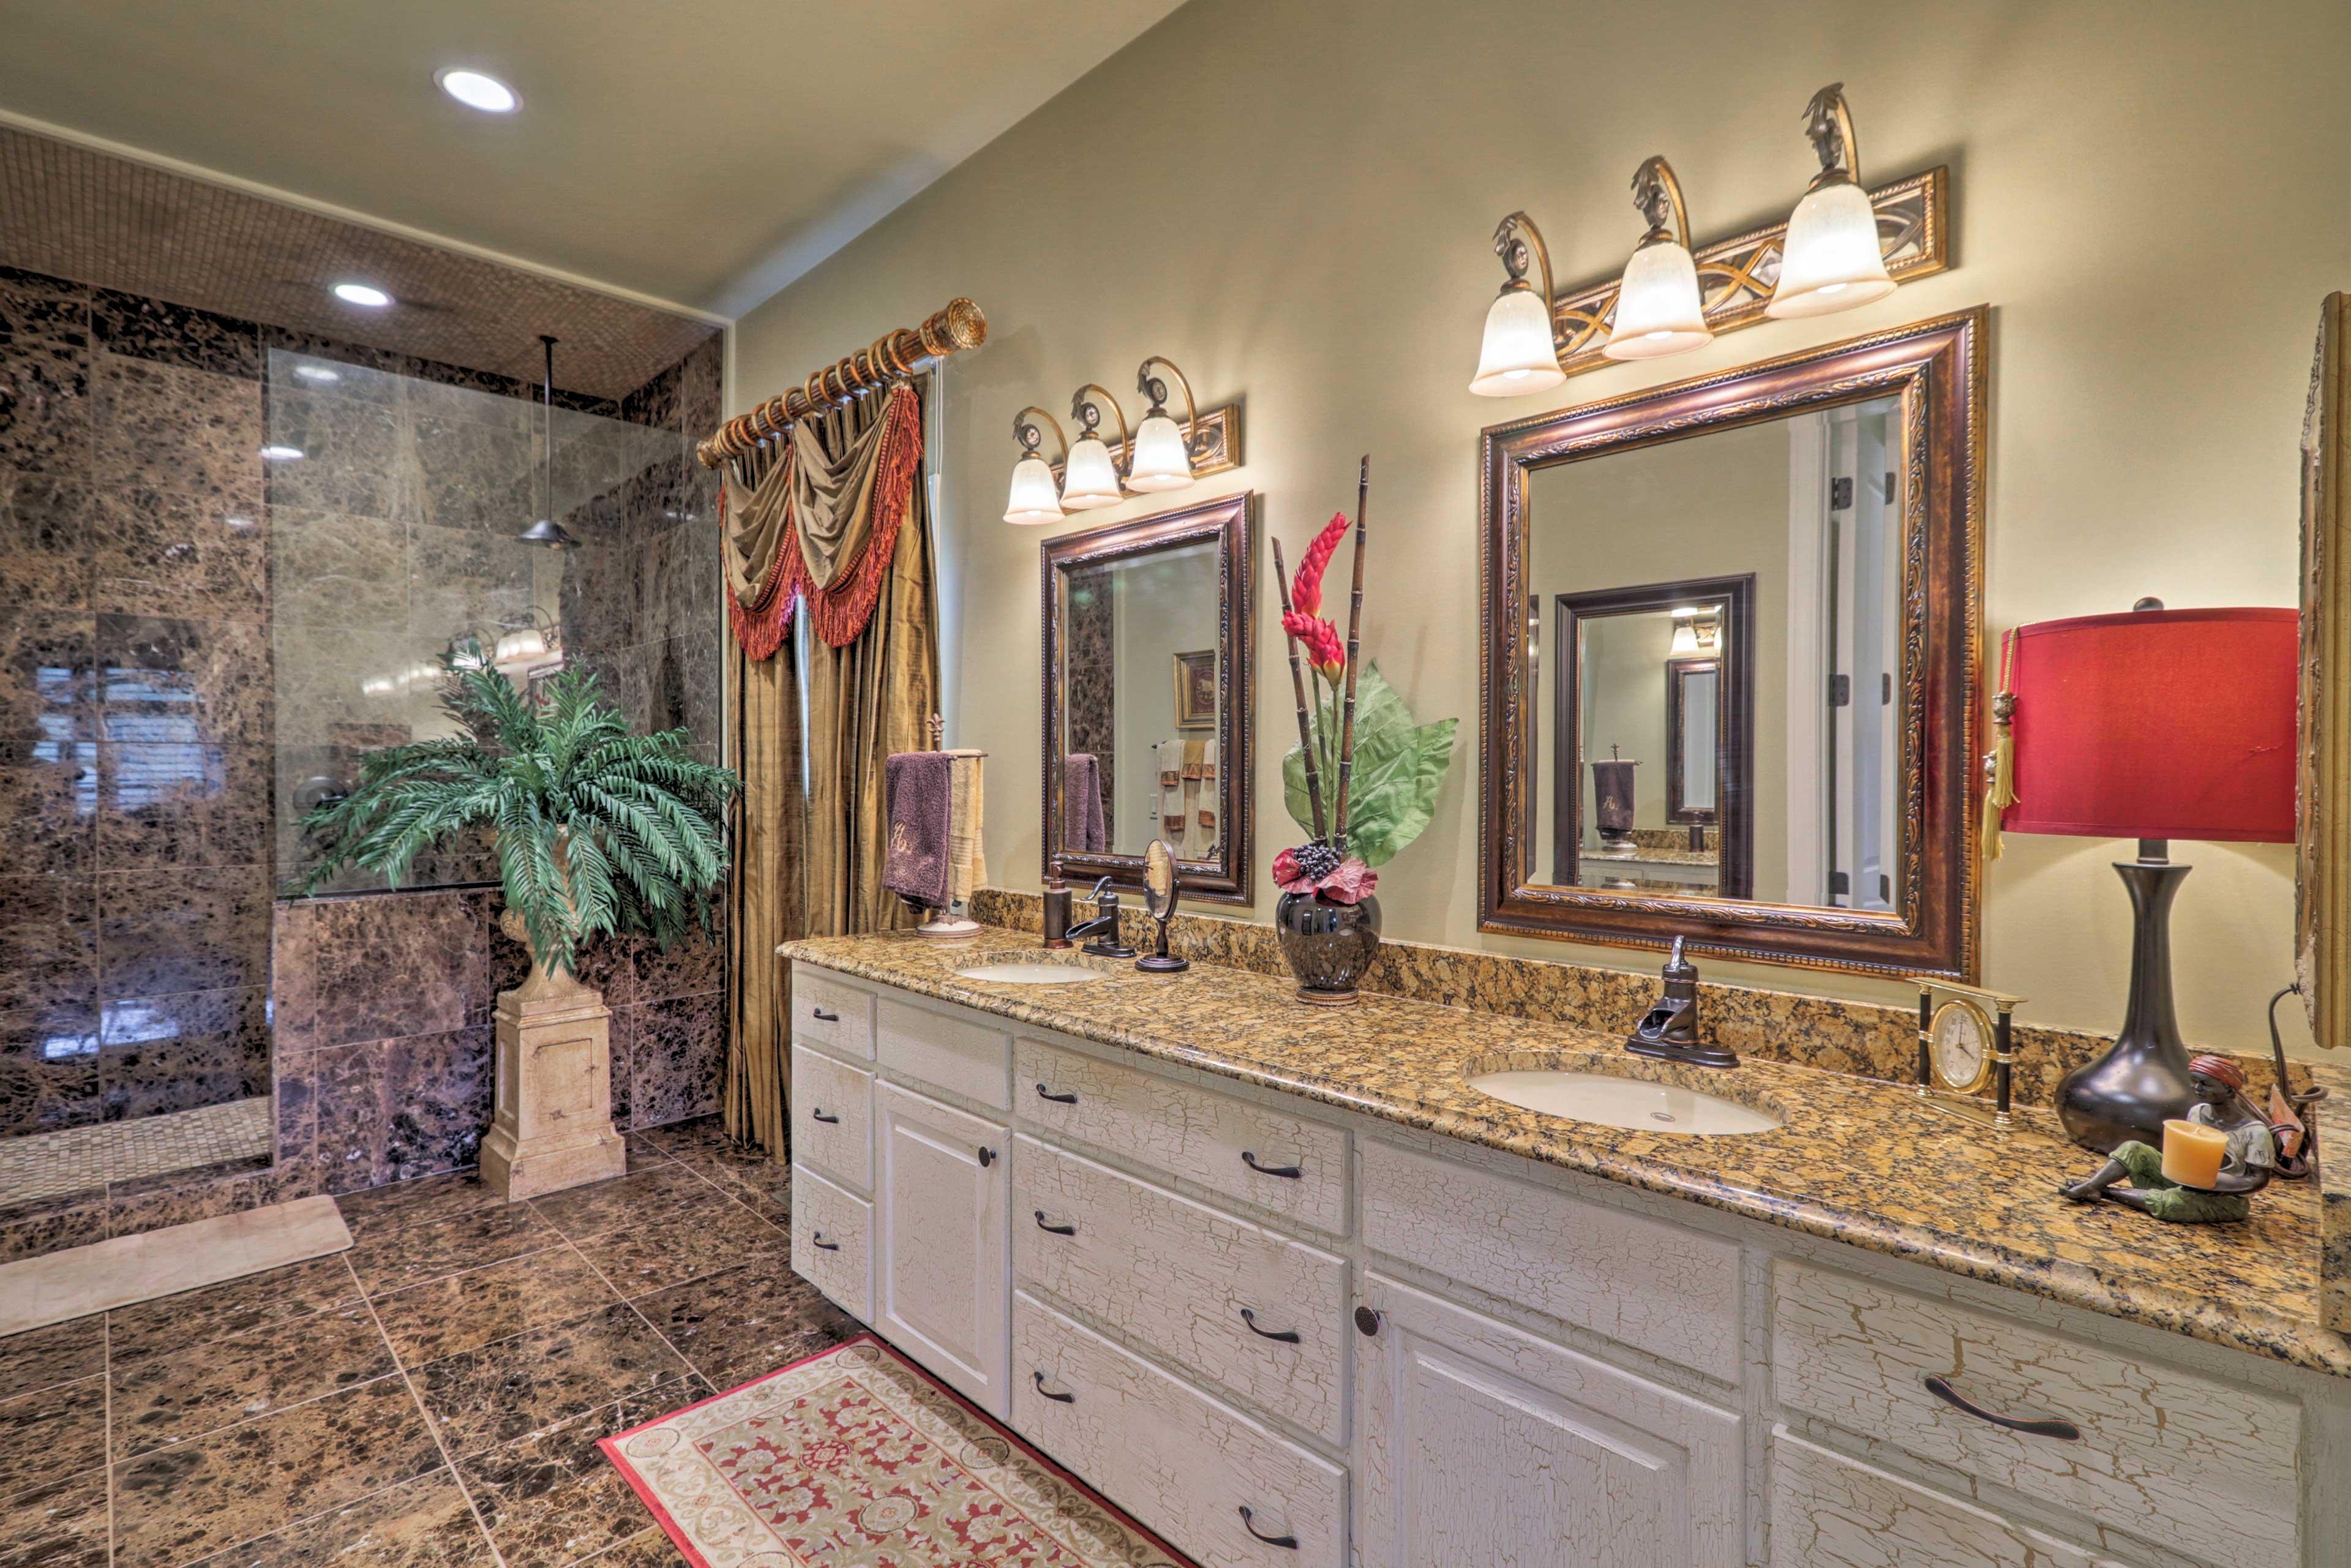 Rinse off in the walk-in shower of the master en-suite bathroom.